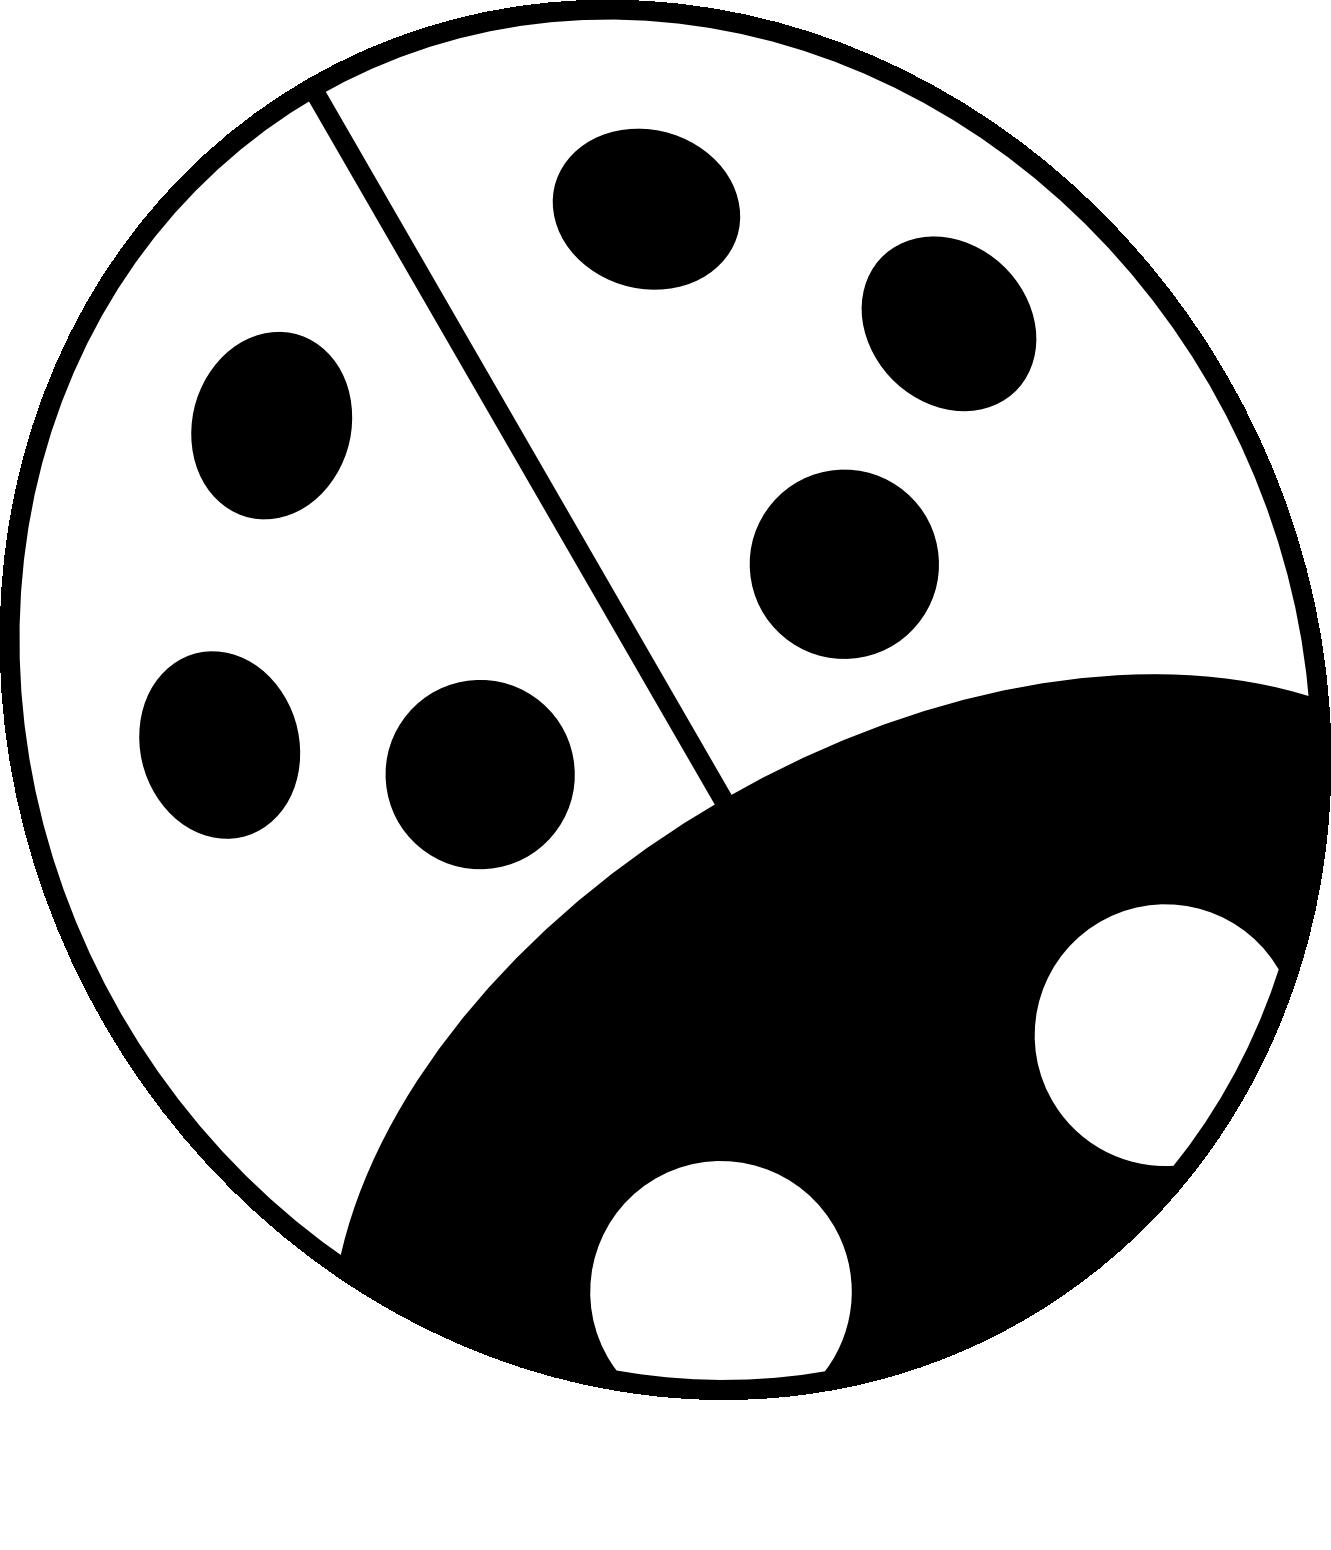 Clip art black and white ladybug 12 black white line art flower clip art black and white ladybug 12 black white line art flower scalable vector graphics svg mightylinksfo